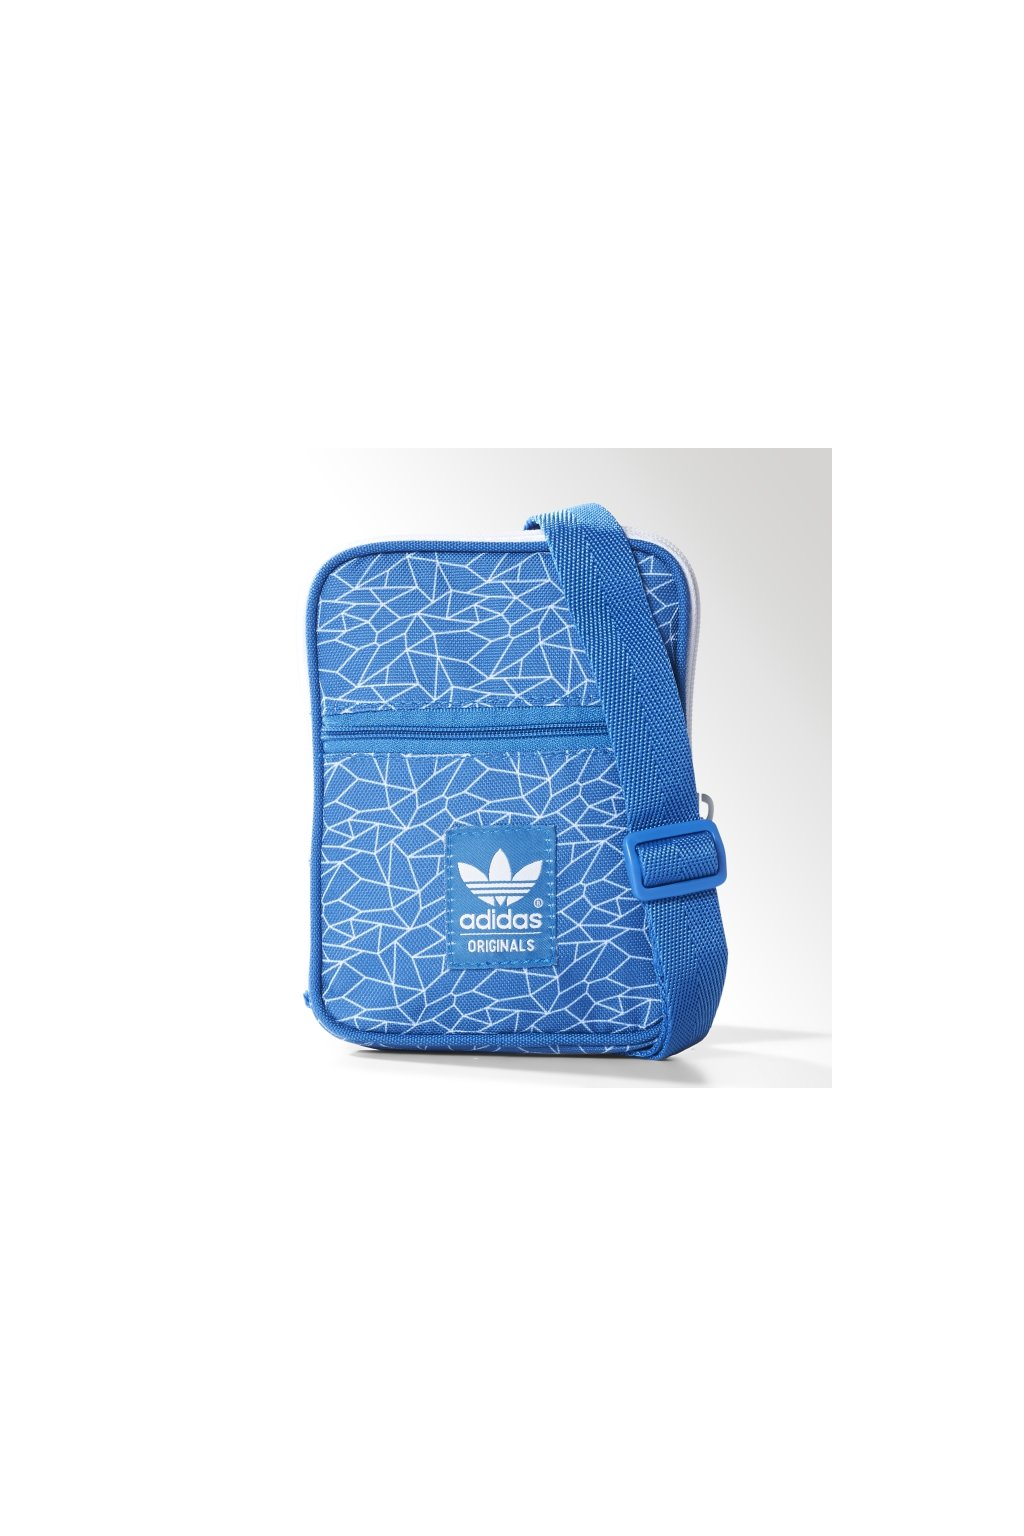 adidas FESTIVAL BAG CL S20258